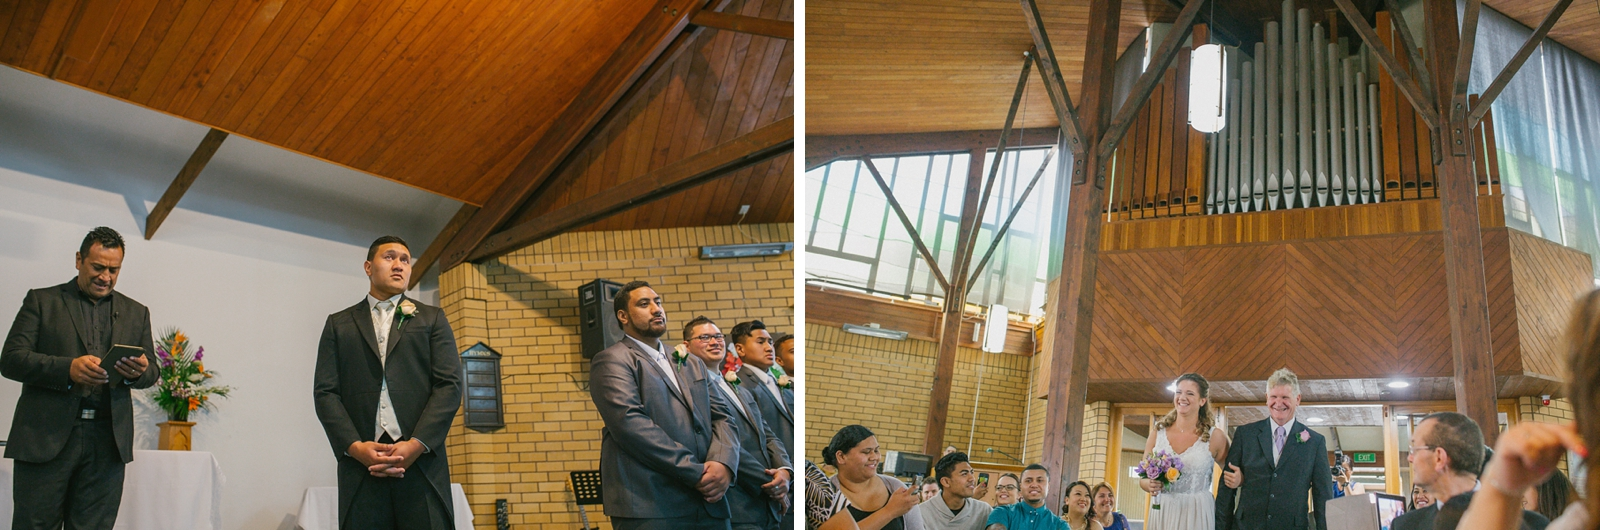 GabbyFiti_Auckland Wedding Photographer_Patty Lagera_0025.jpg